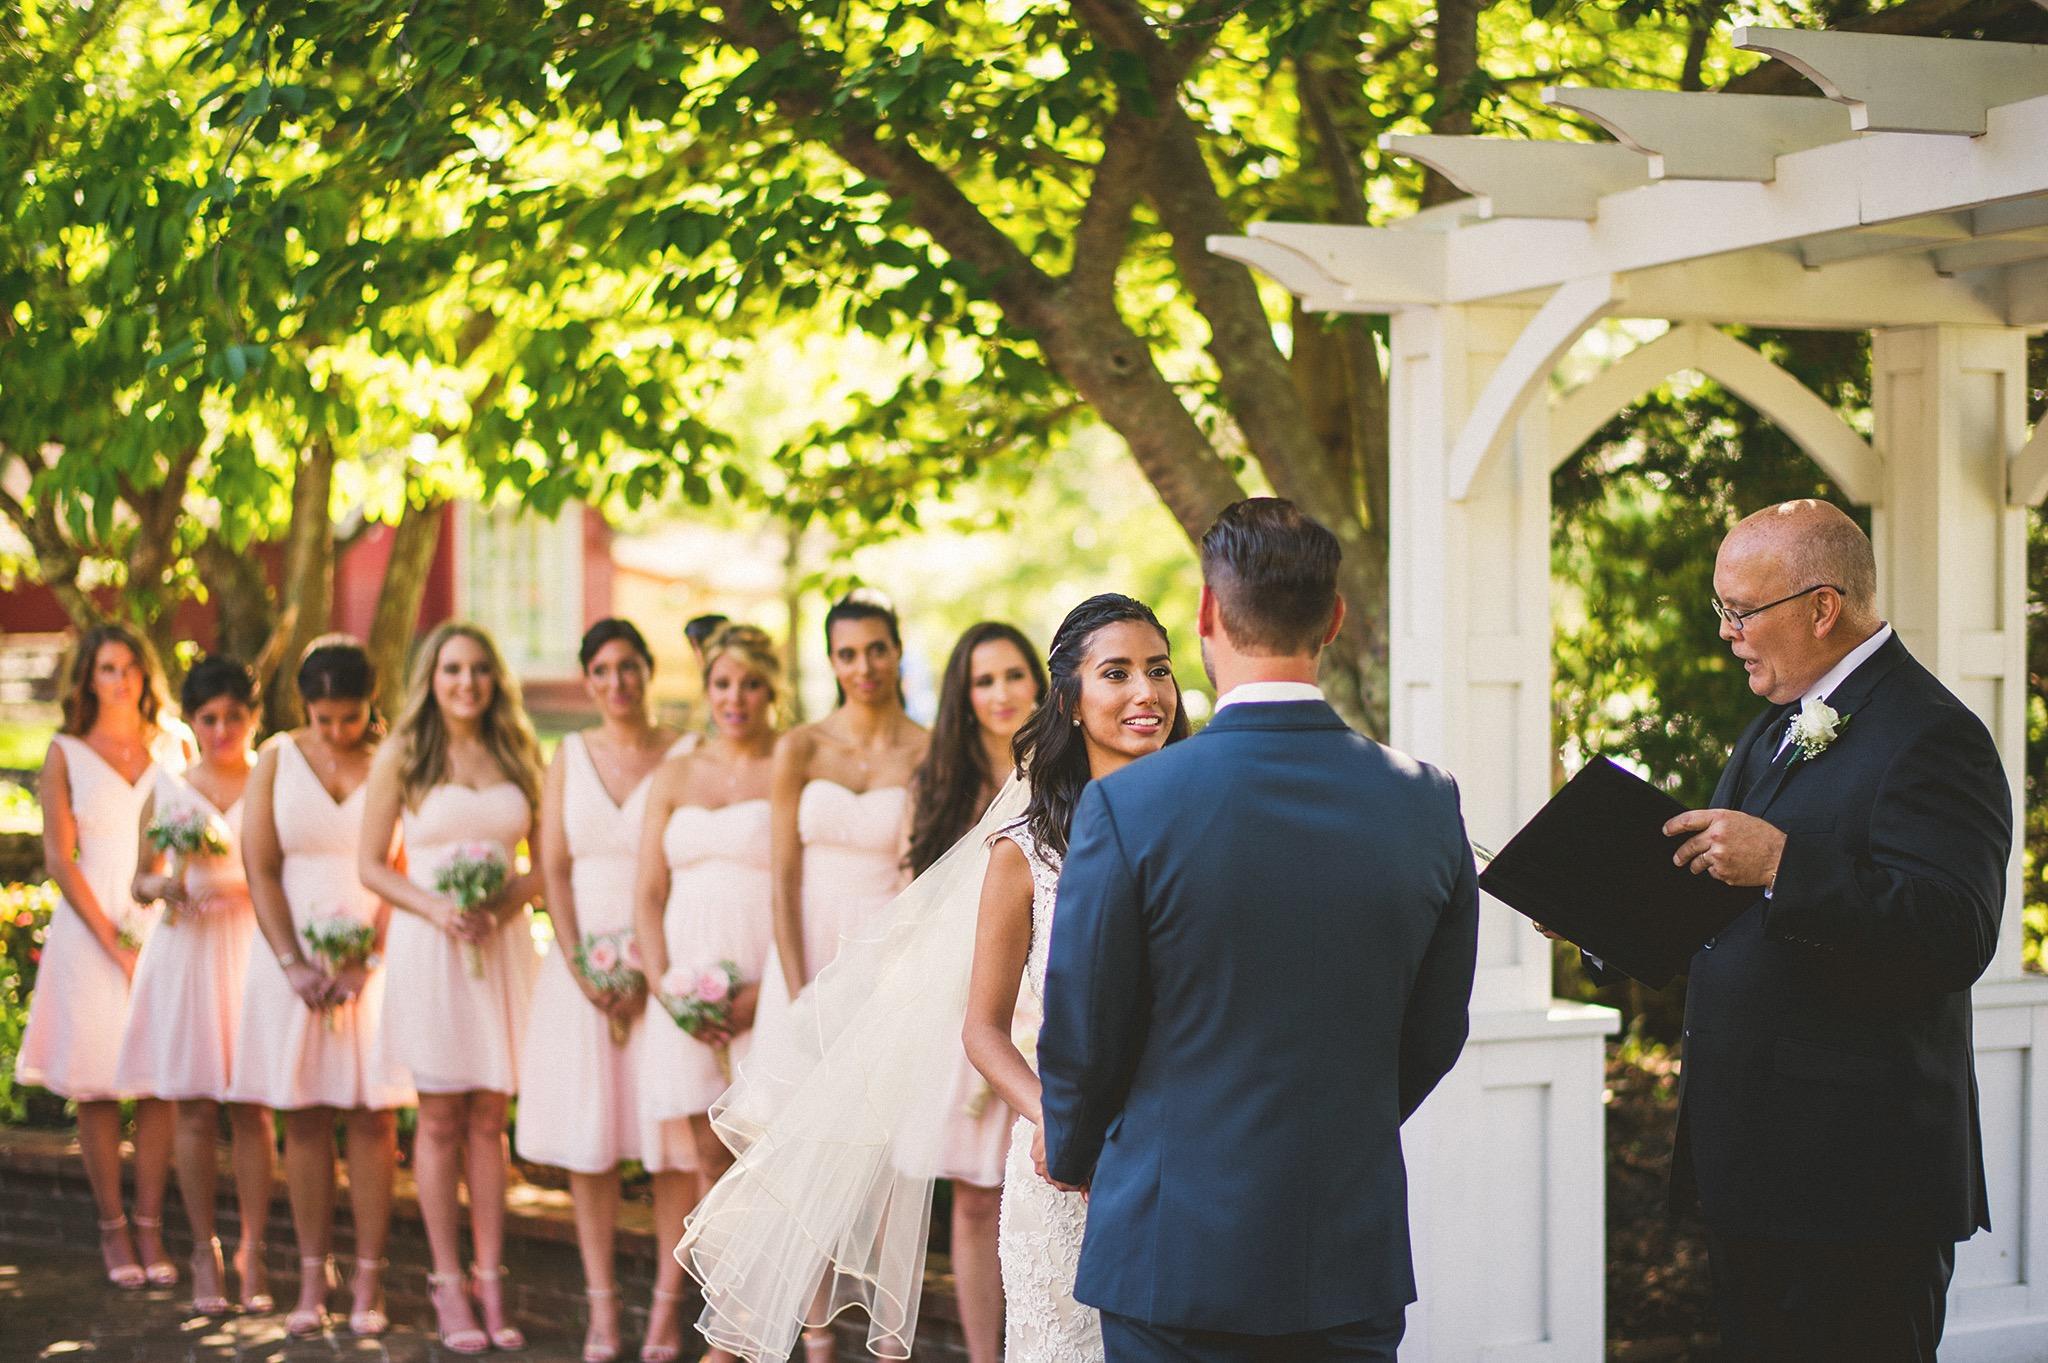 53-bride-reciting-vows.jpg